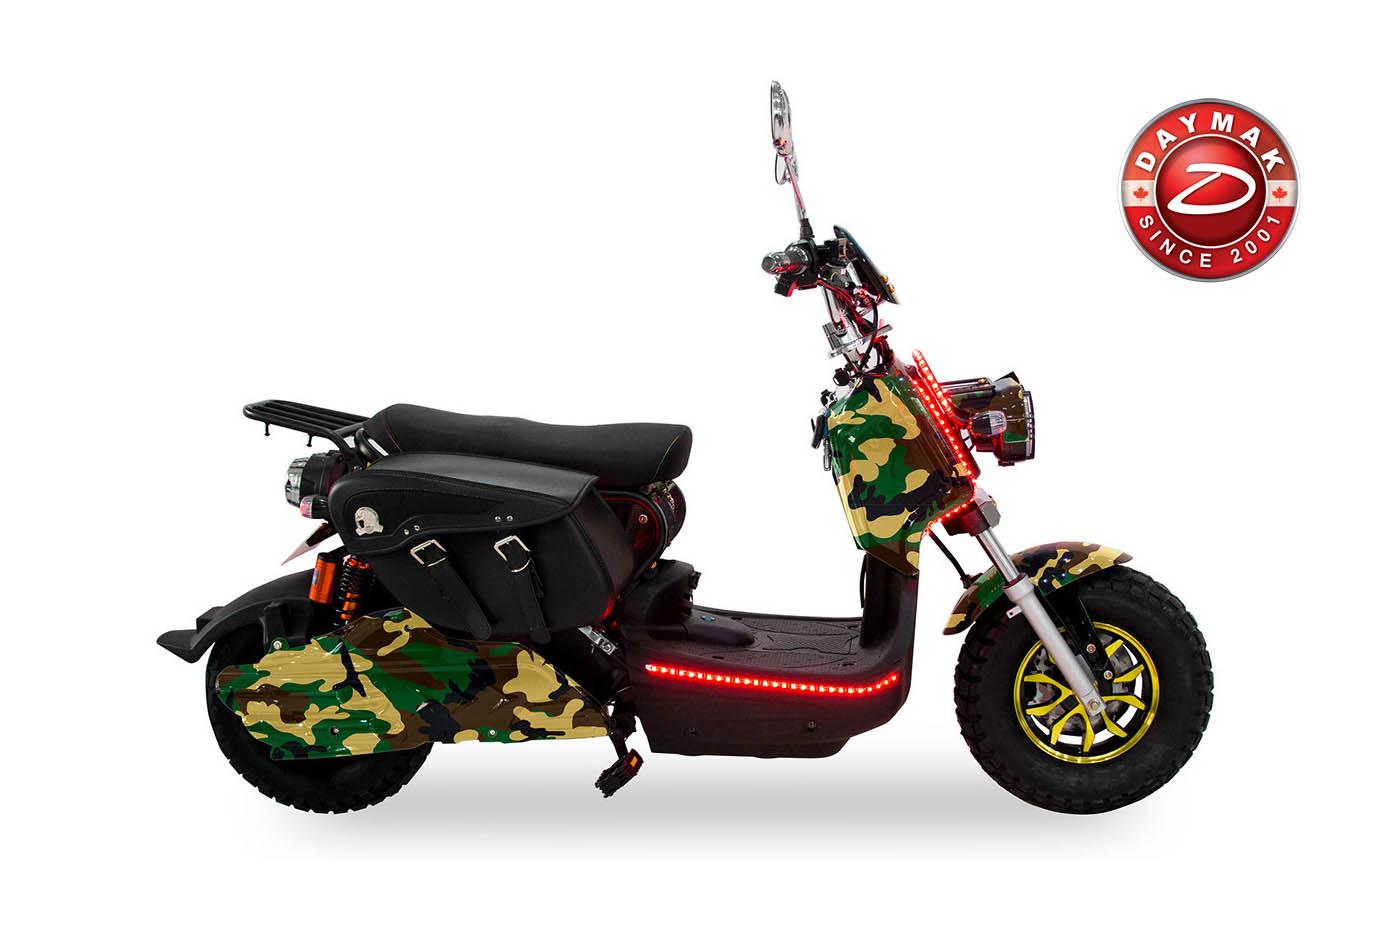 scooter electrique eagle deluxe Daymak CAMO- logo-daymak